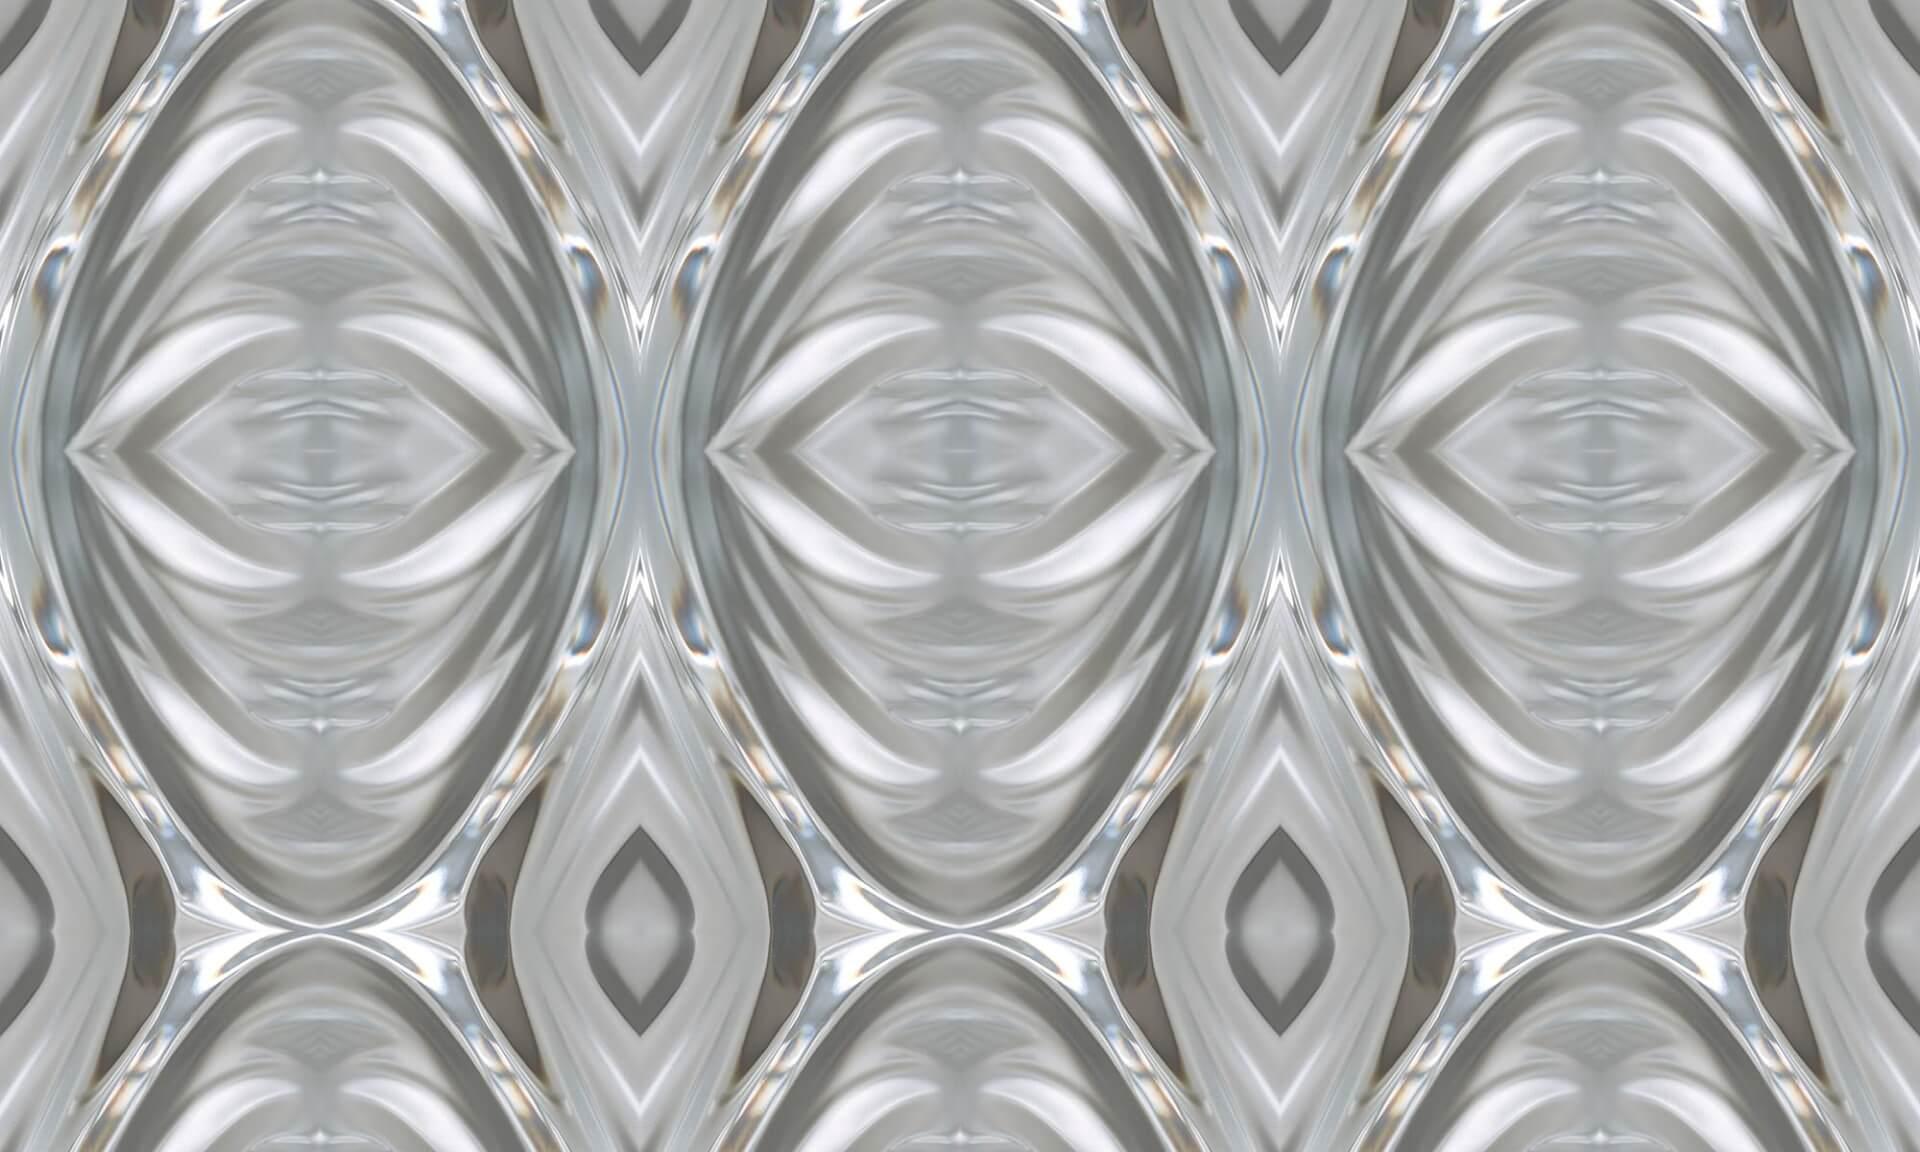 Crystal (DE9051) Doug Garrabrants